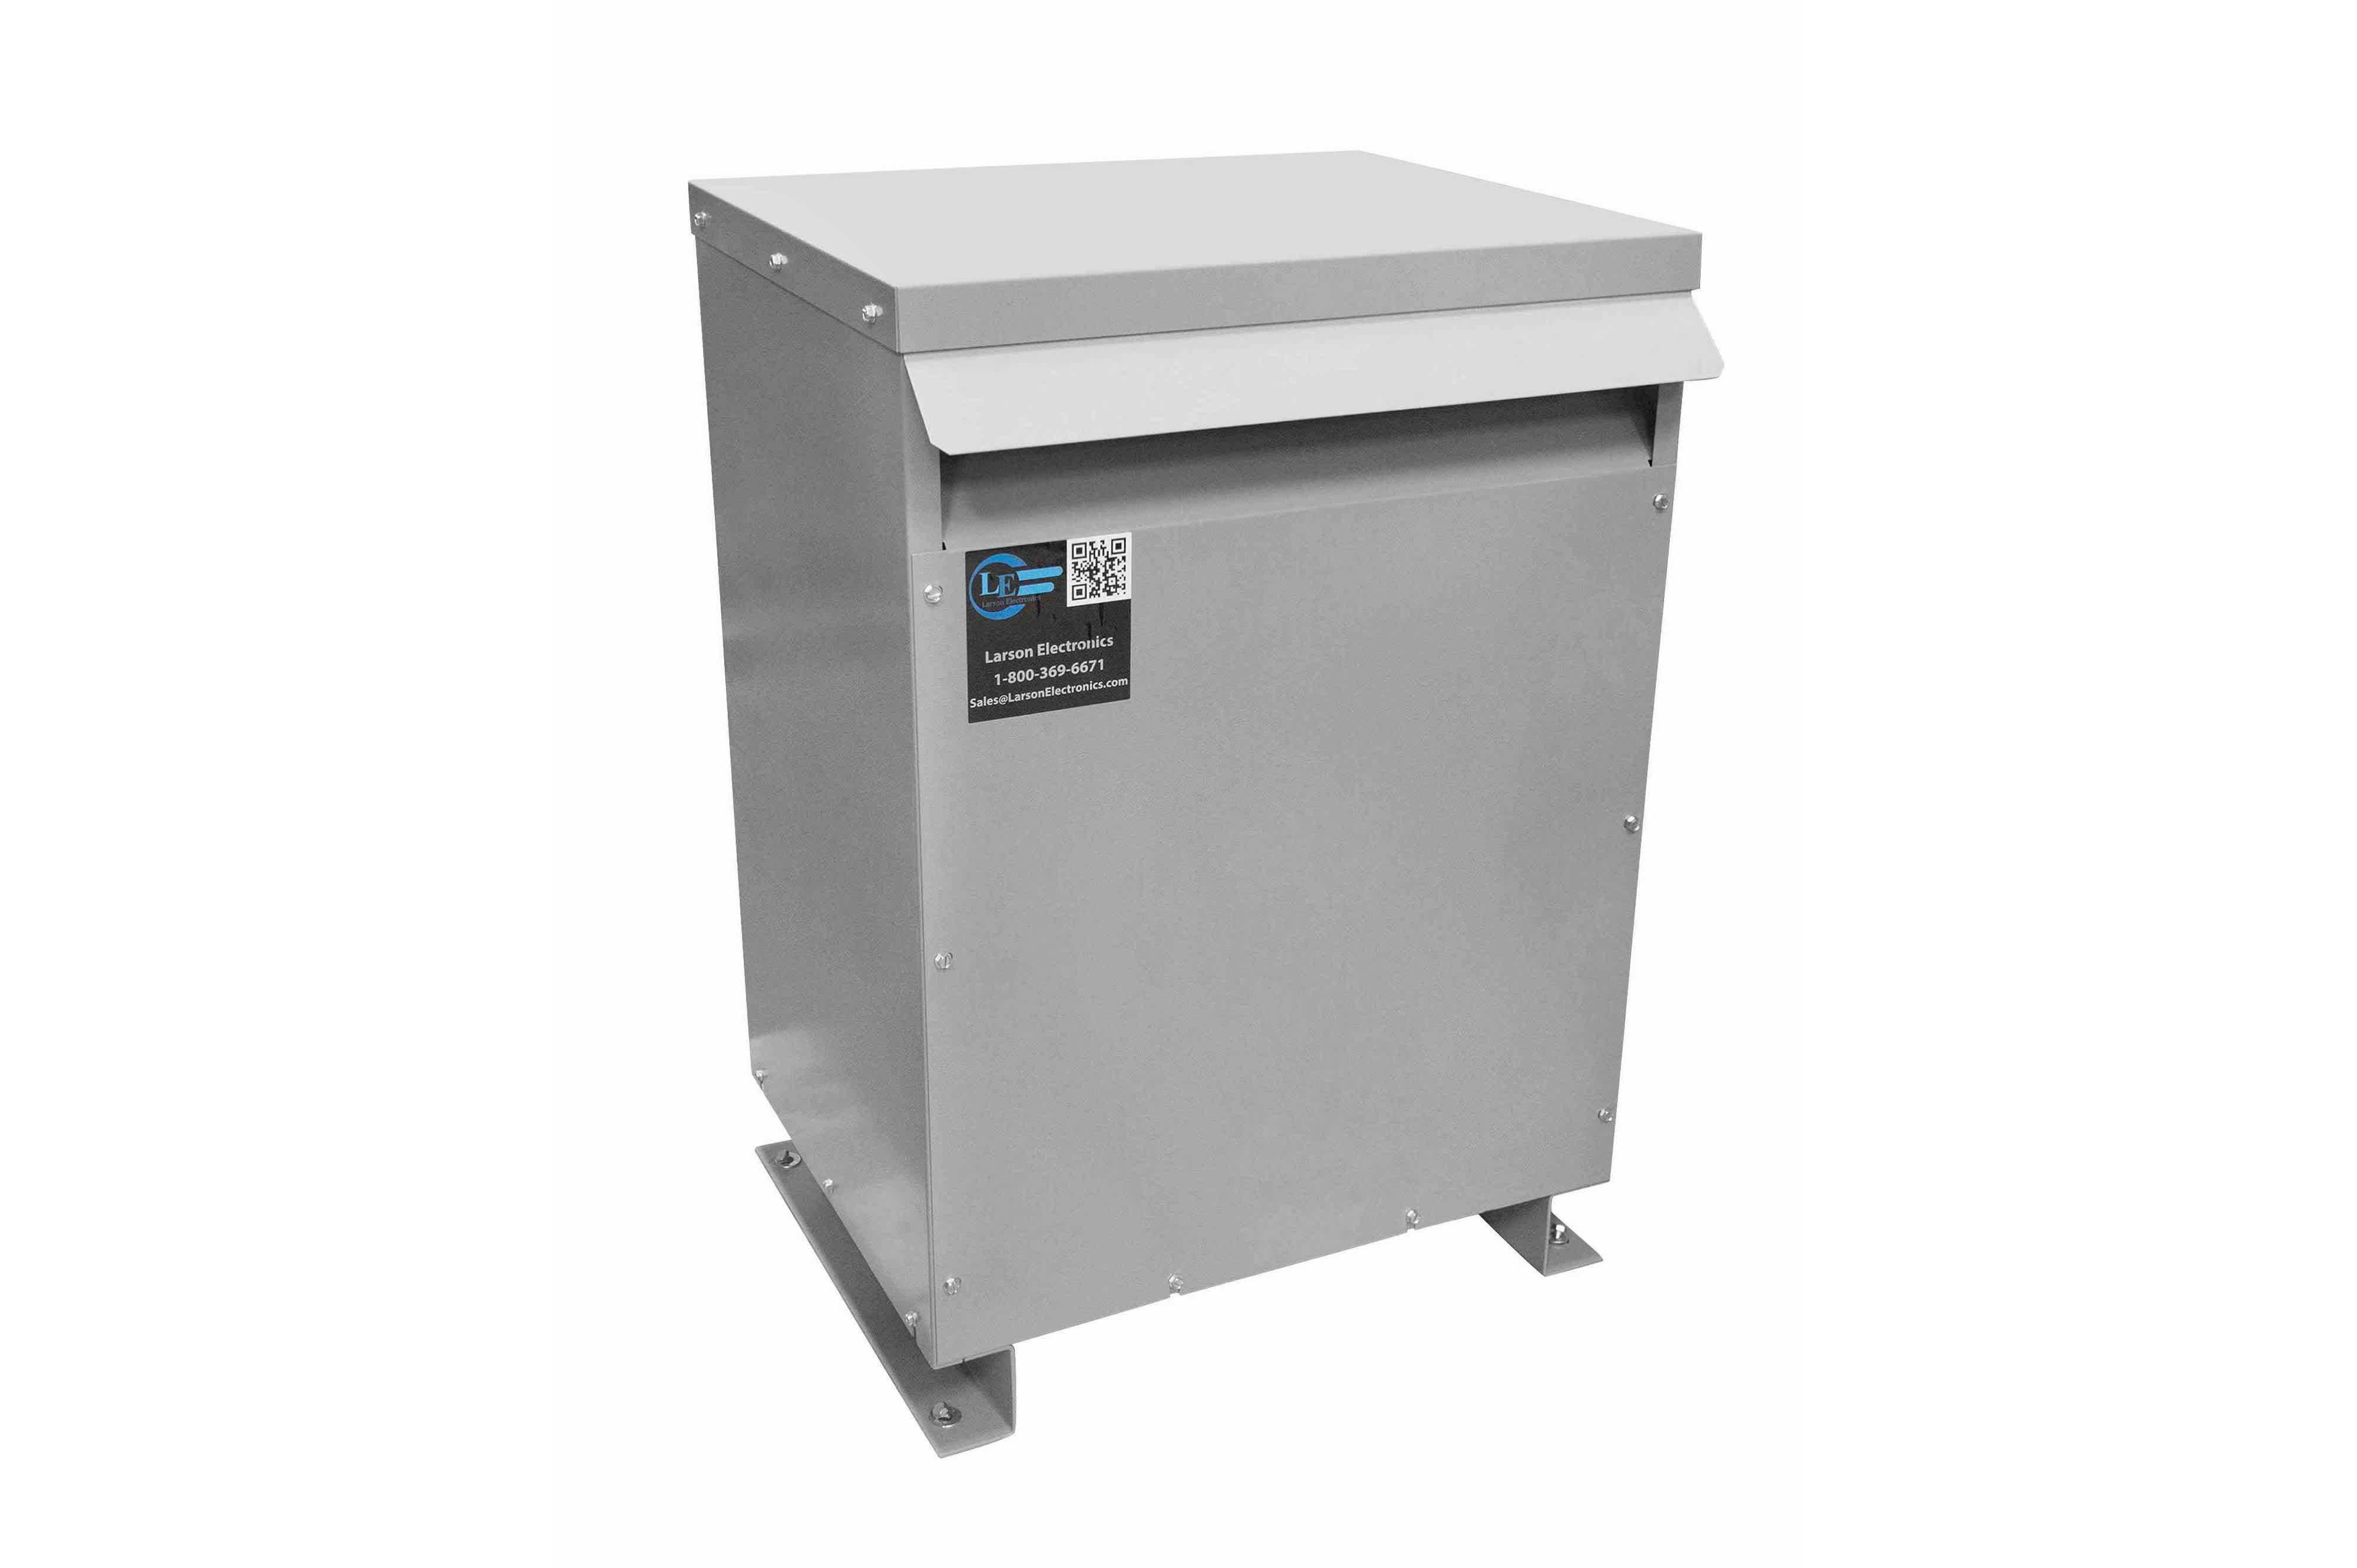 700 kVA 3PH DOE Transformer, 240V Delta Primary, 400Y/231 Wye-N Secondary, N3R, Ventilated, 60 Hz